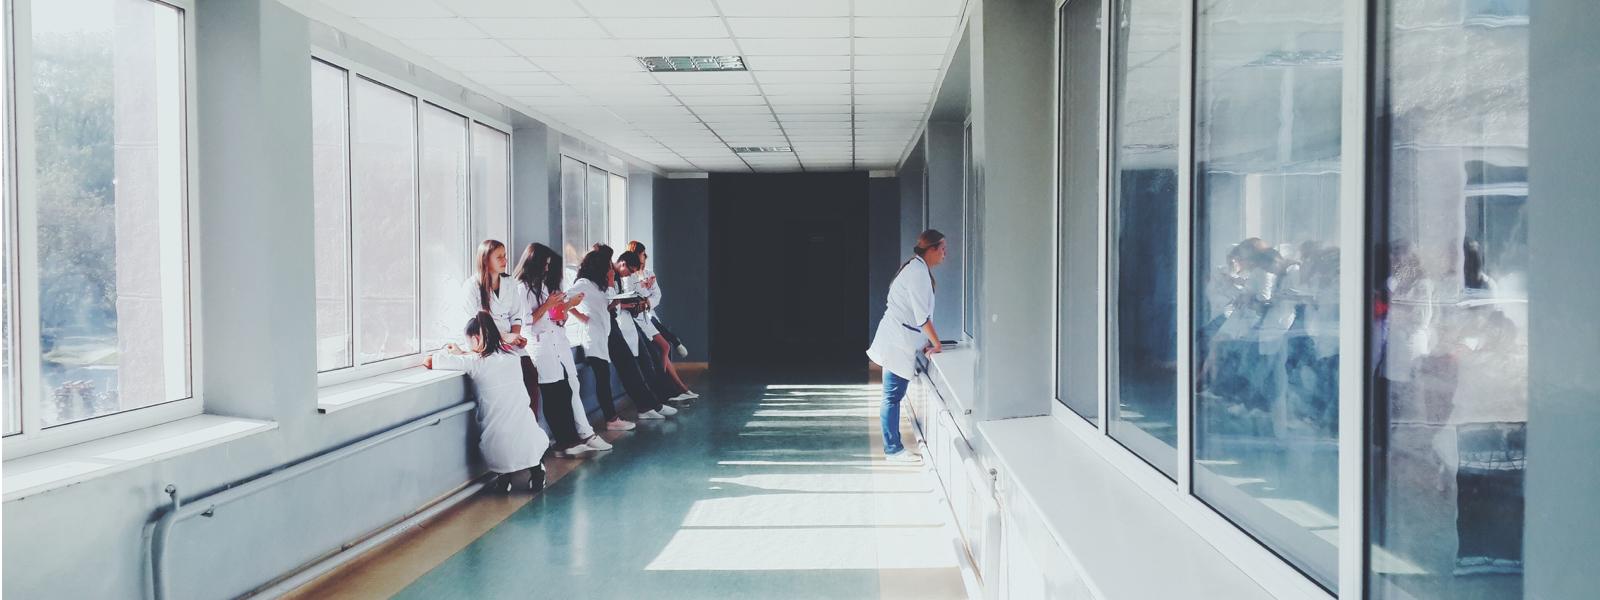 nurses waiting in hallway new grad residency program nursing school